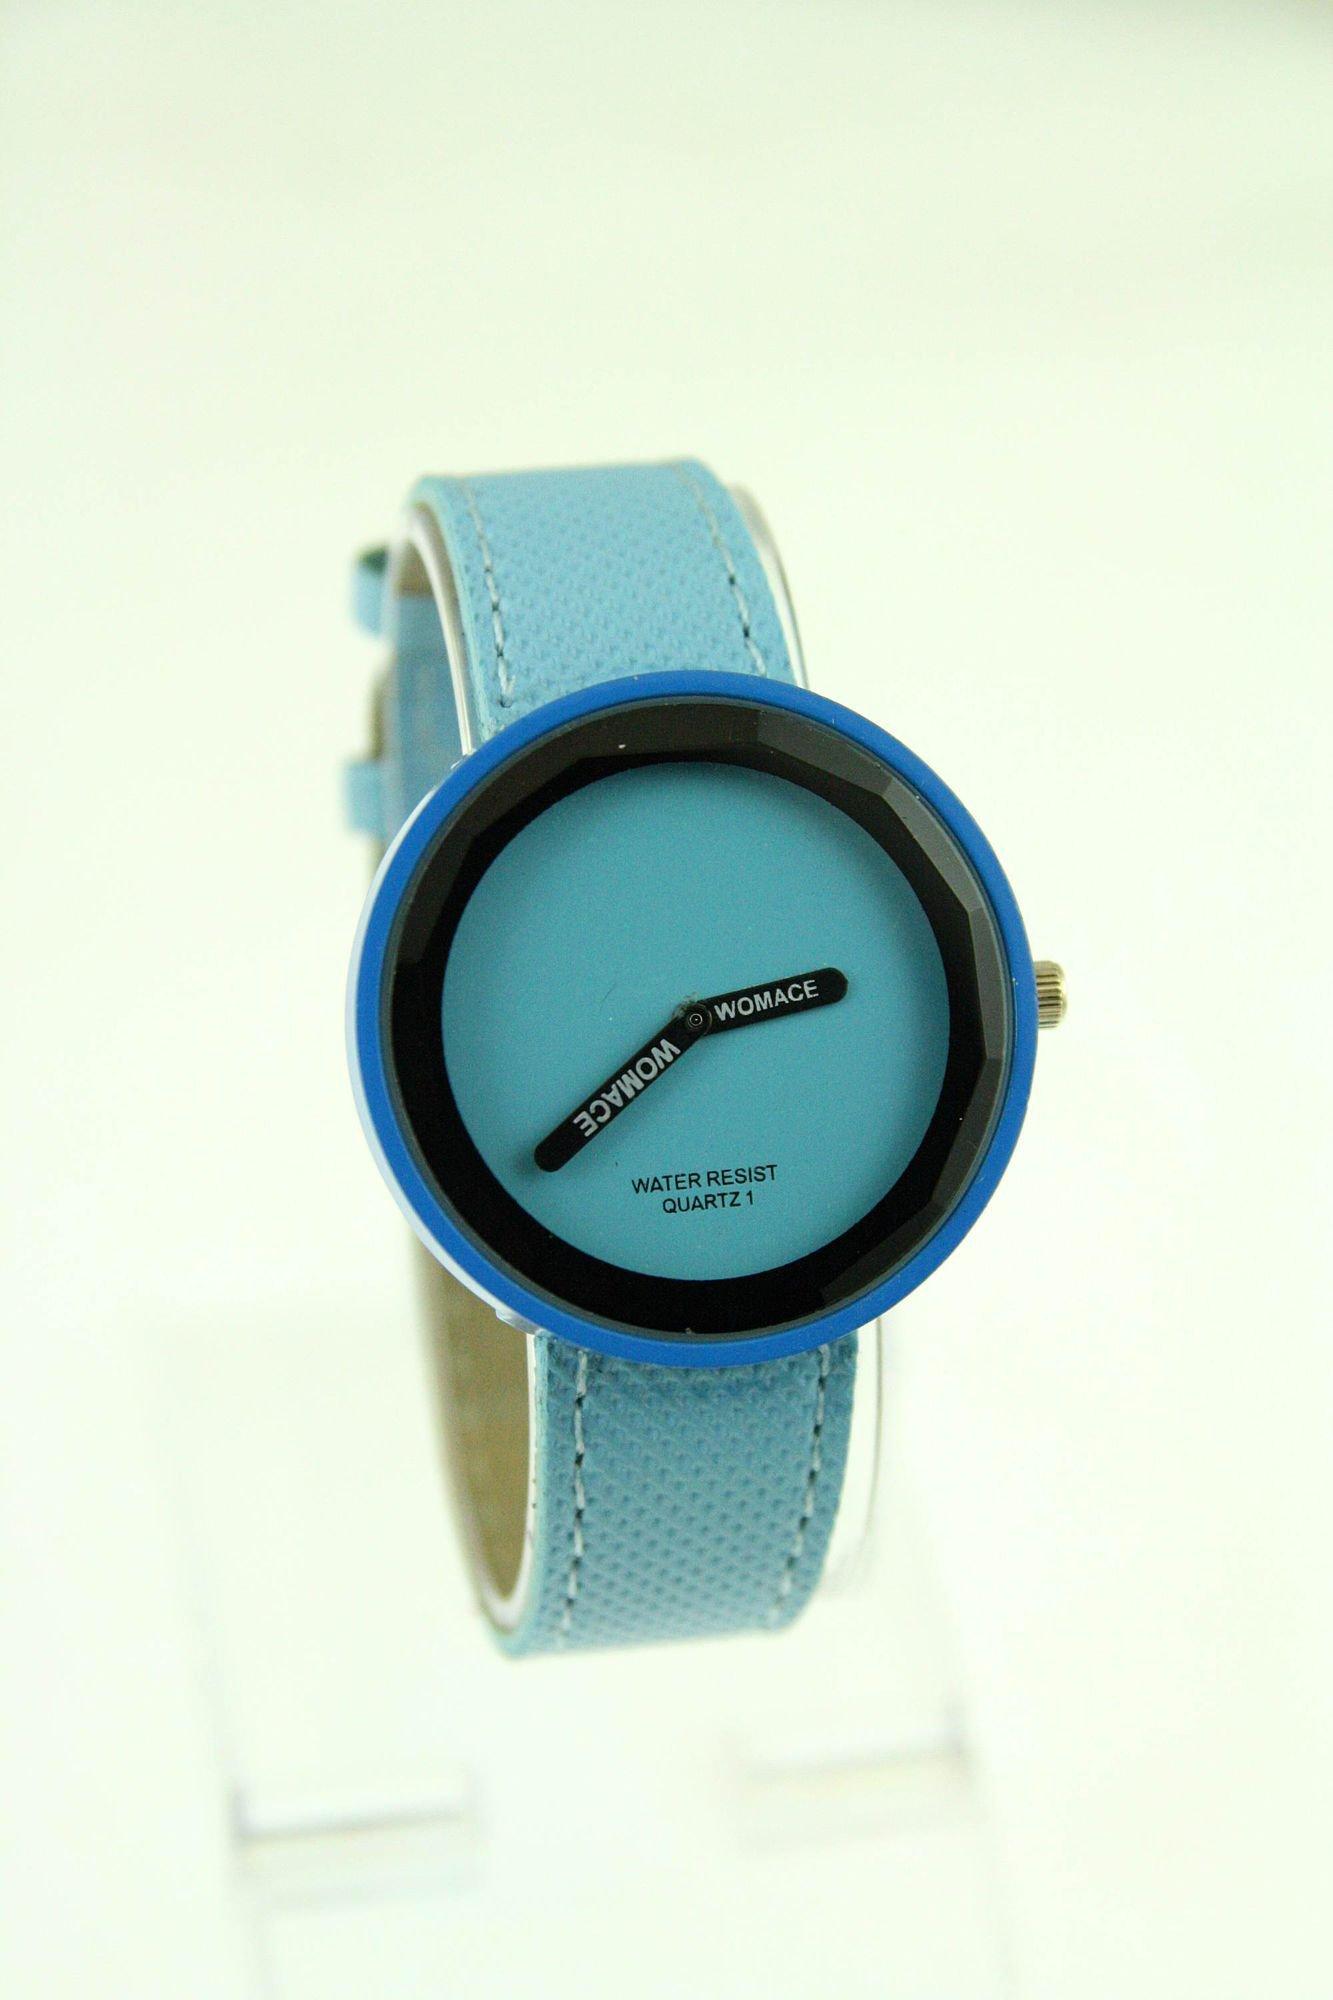 Niebieski zegarek damski na pasku                                  zdj.                                  1